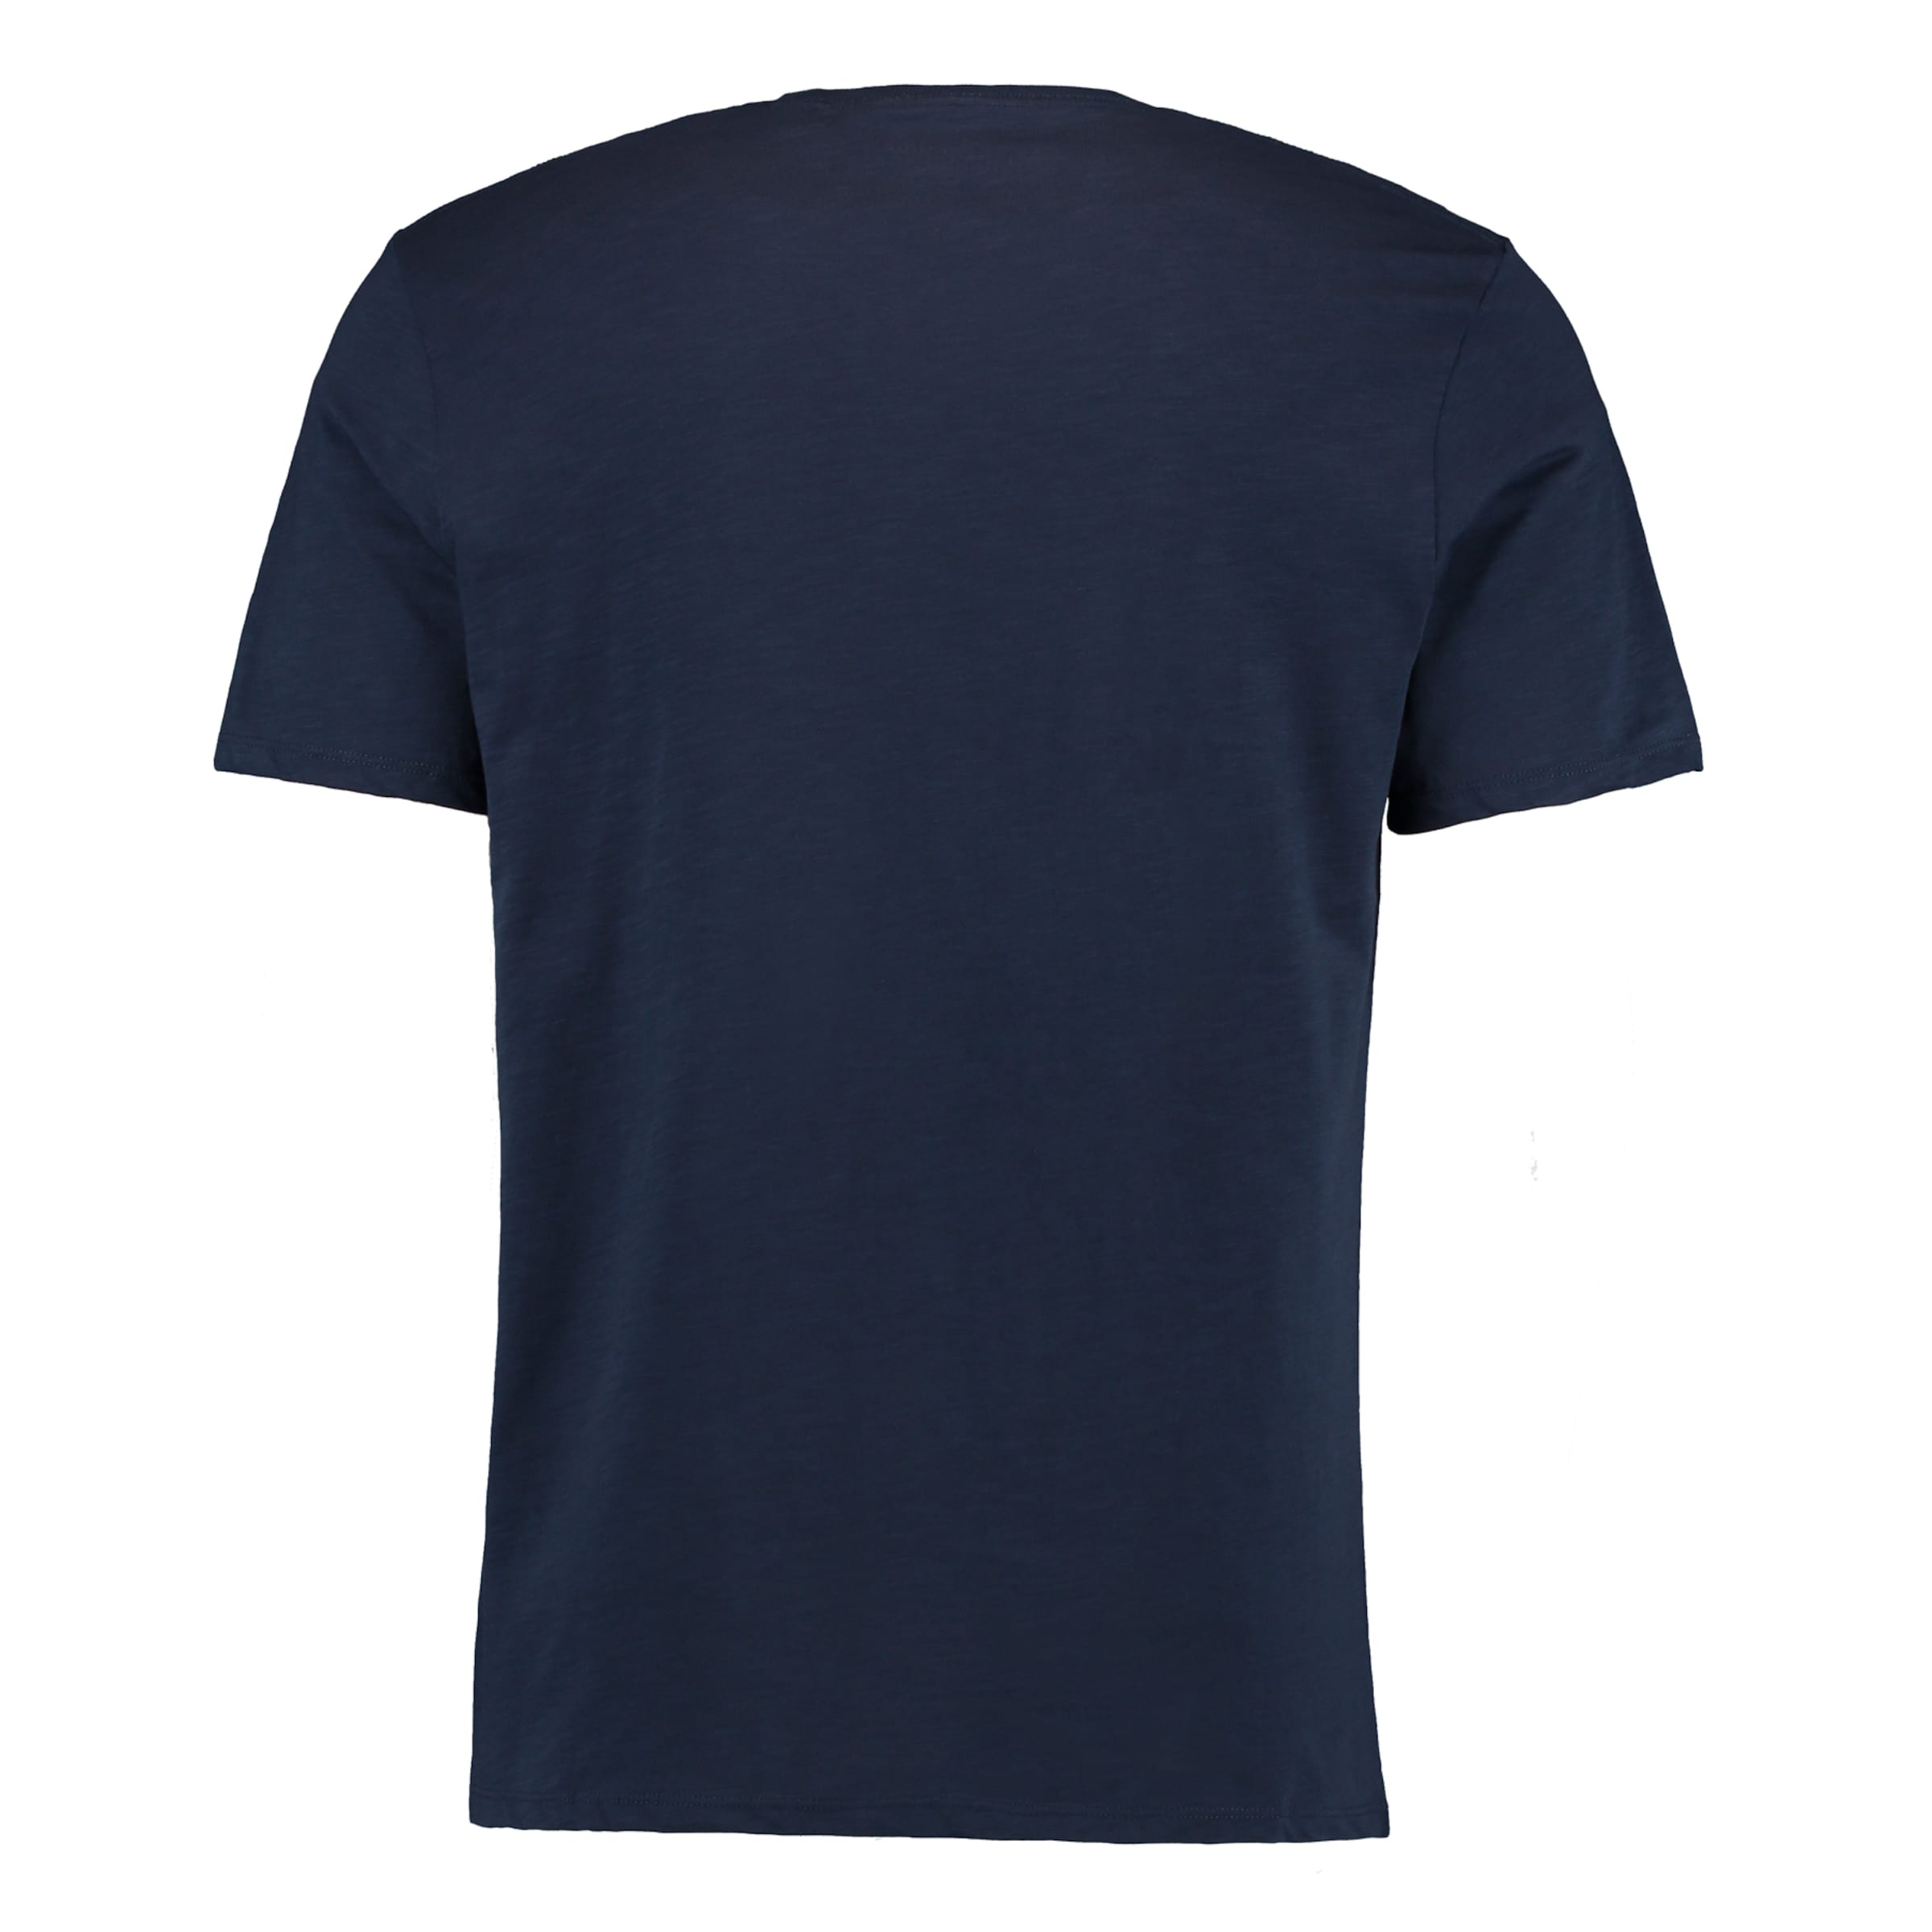 O'NEILL T-shirt 'LM Jacks Reg Fit' Günstig Kaufen Vermarktbare Hn6mLZSyVH